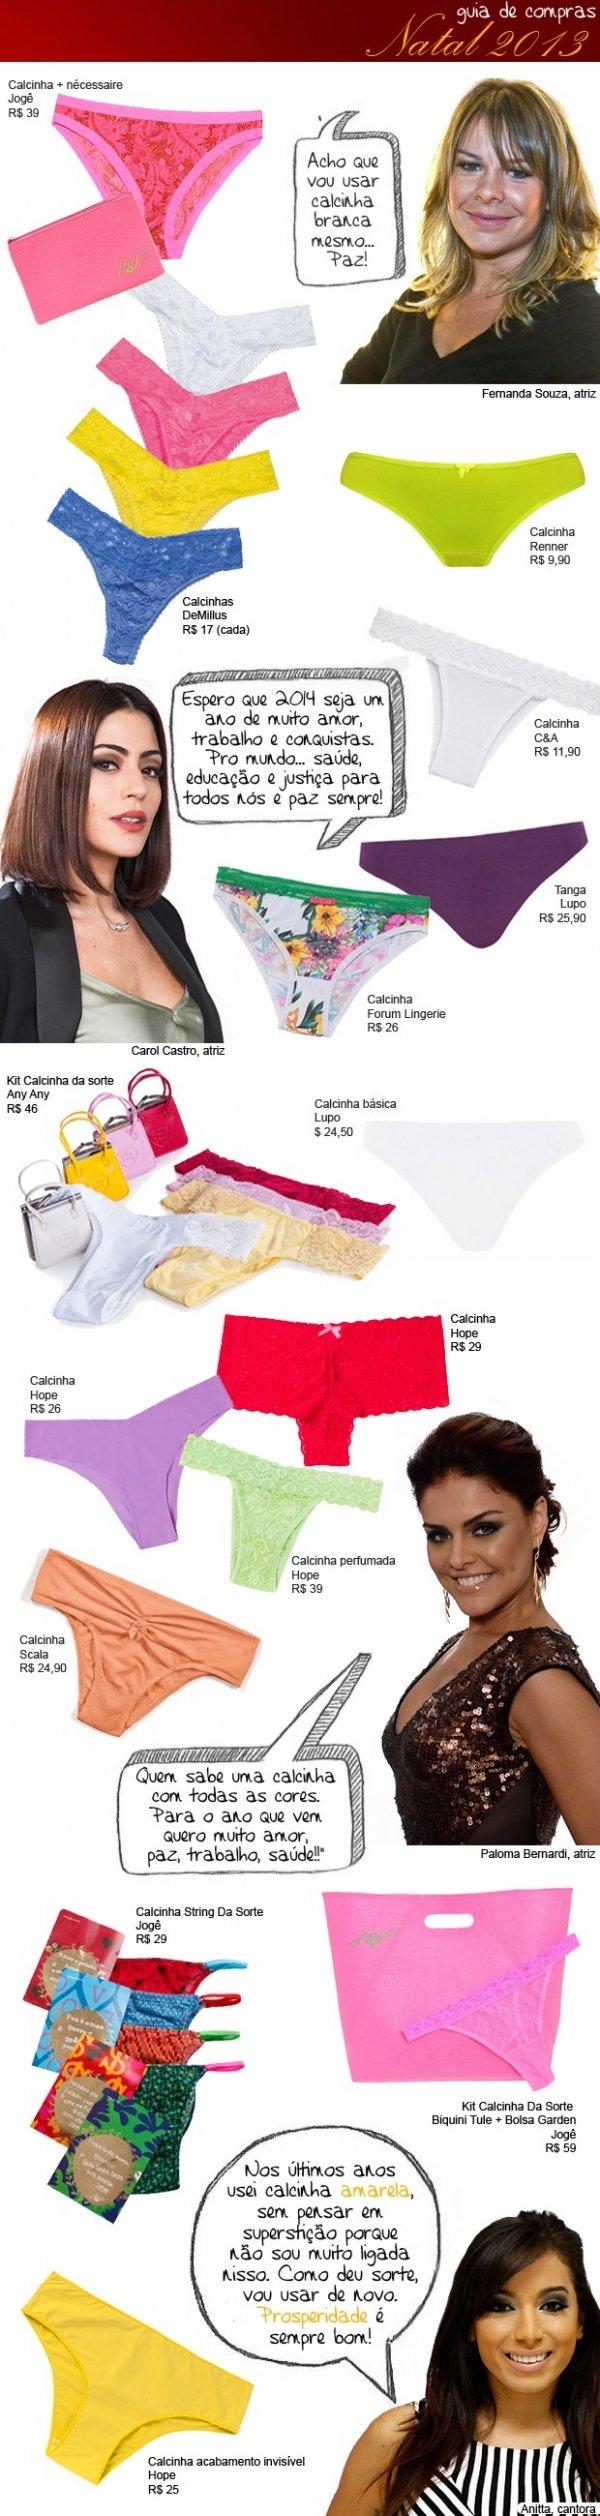 Faça como Anitta e escolha a cor da calcinha para o réveillon 2014